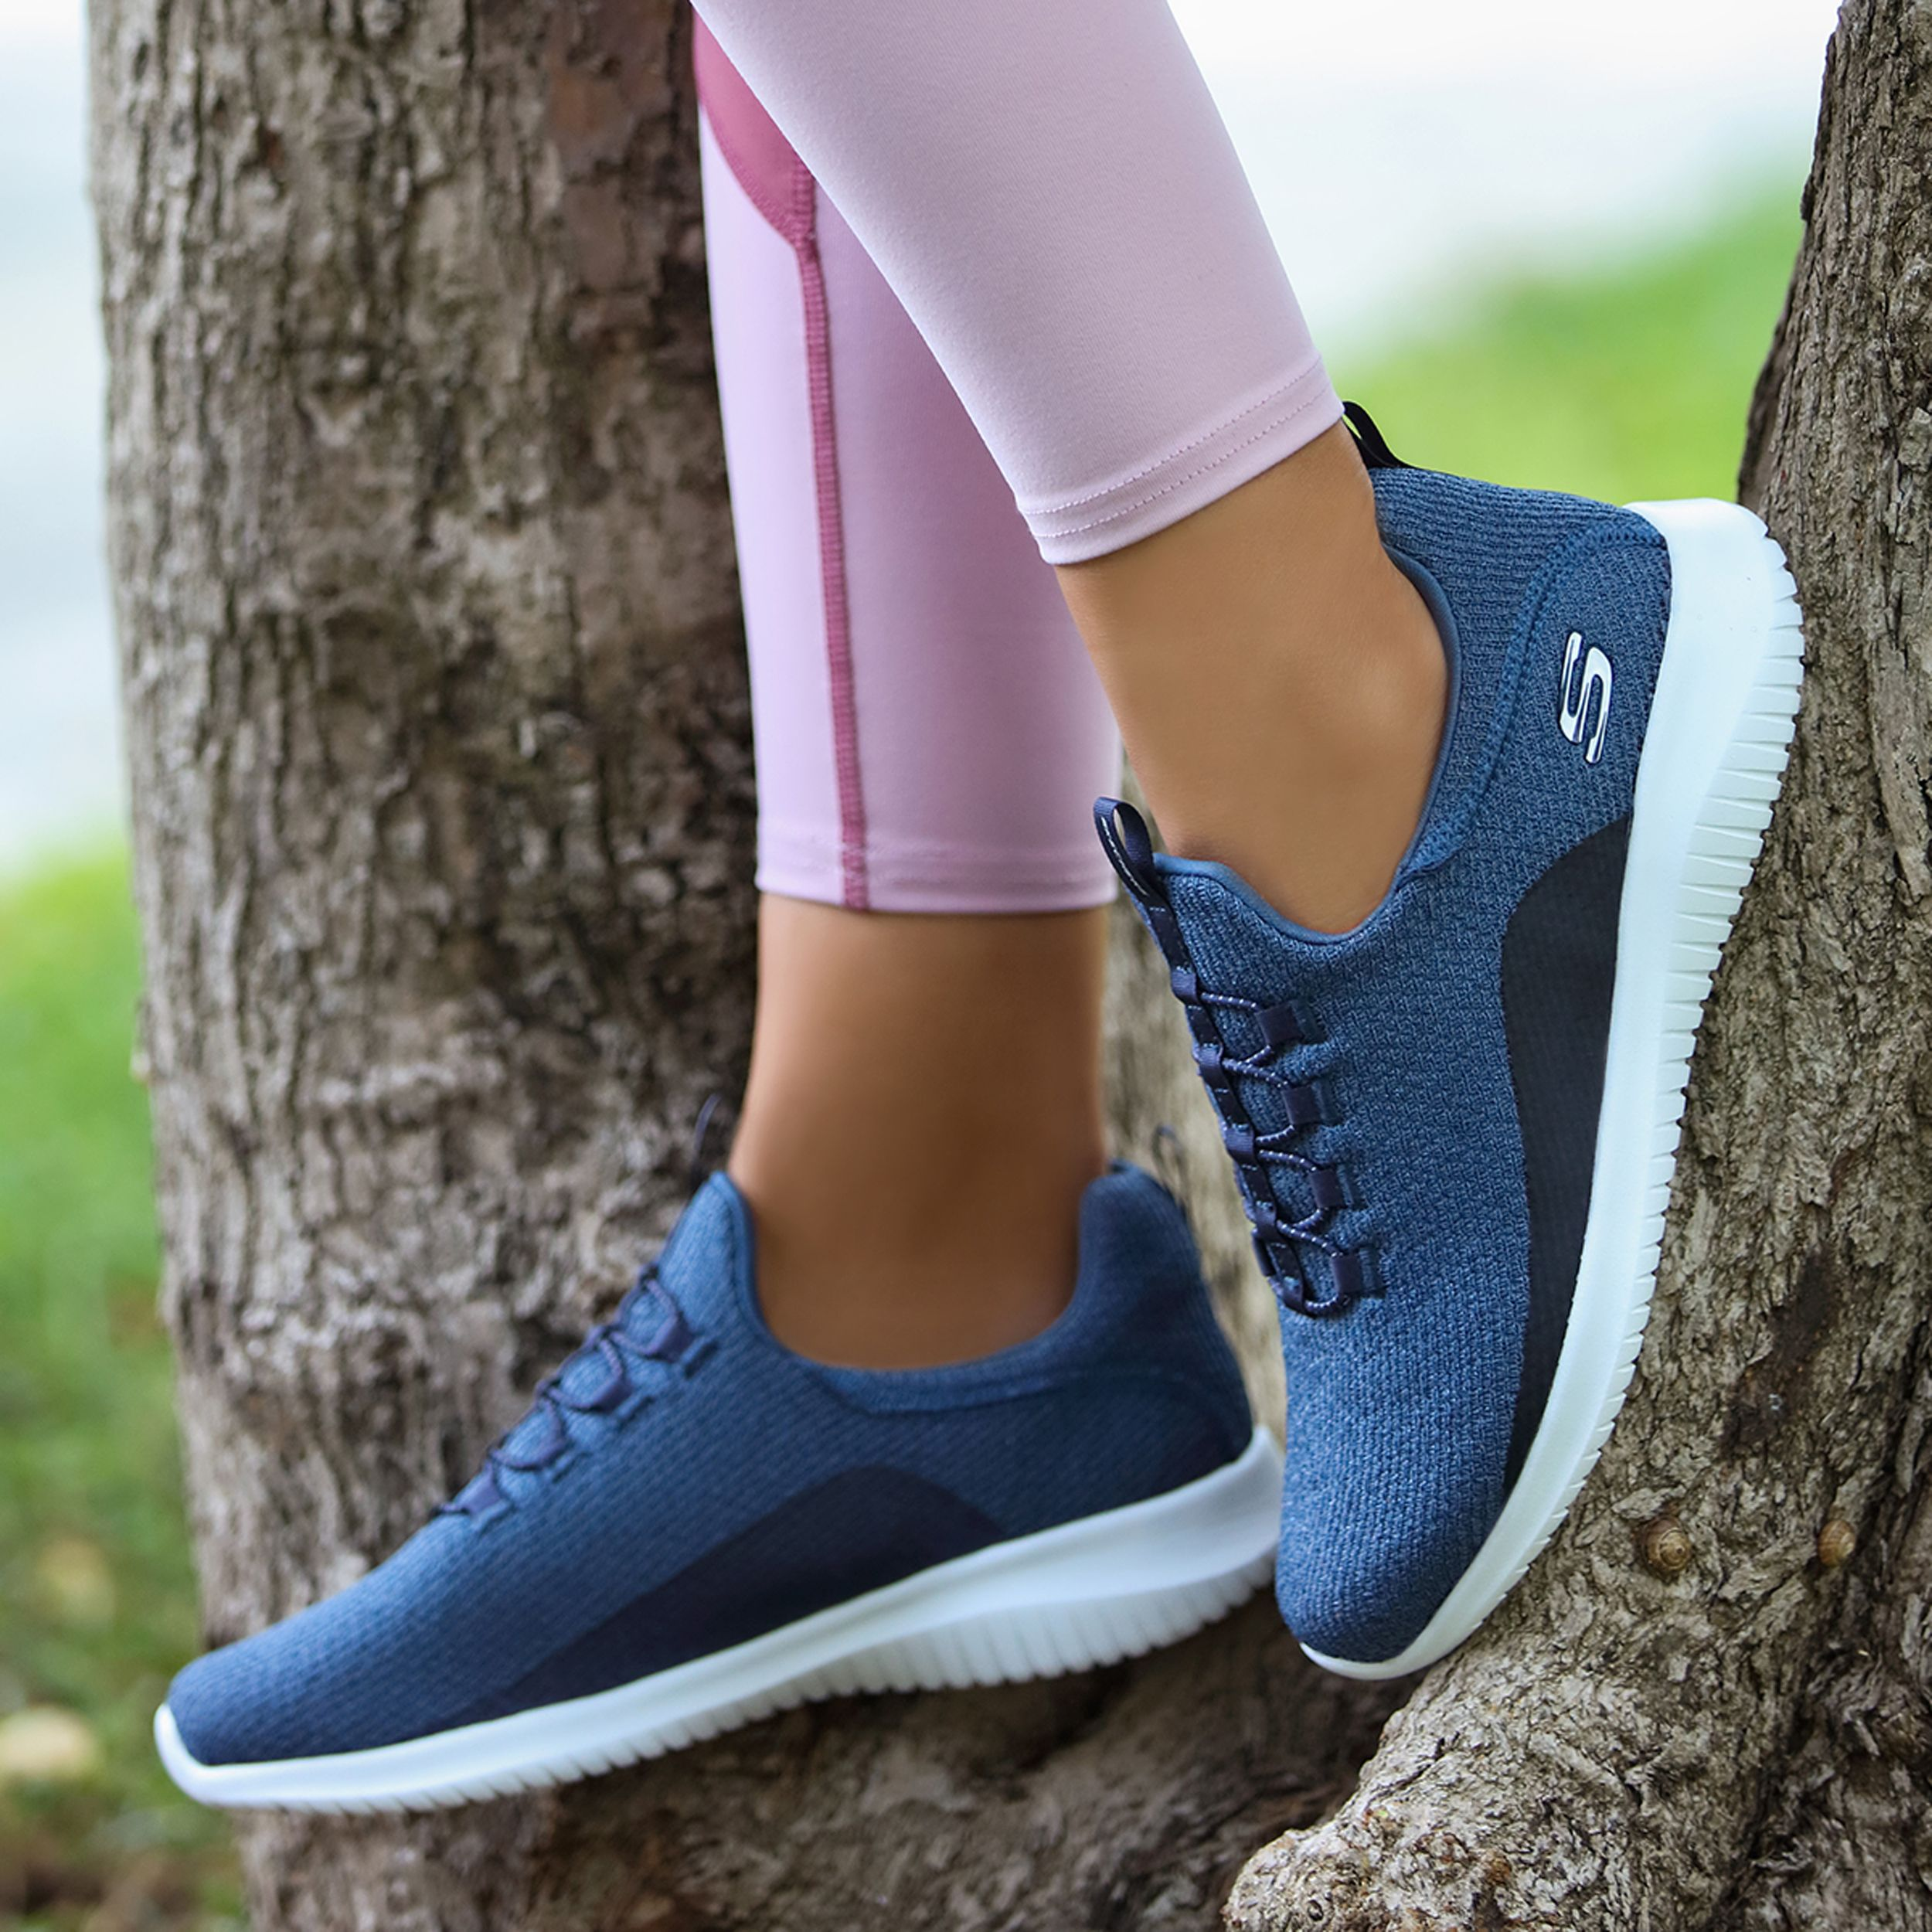 Ultra Flex Sketchers Shoes Women Casual Shoes Women Sneakers